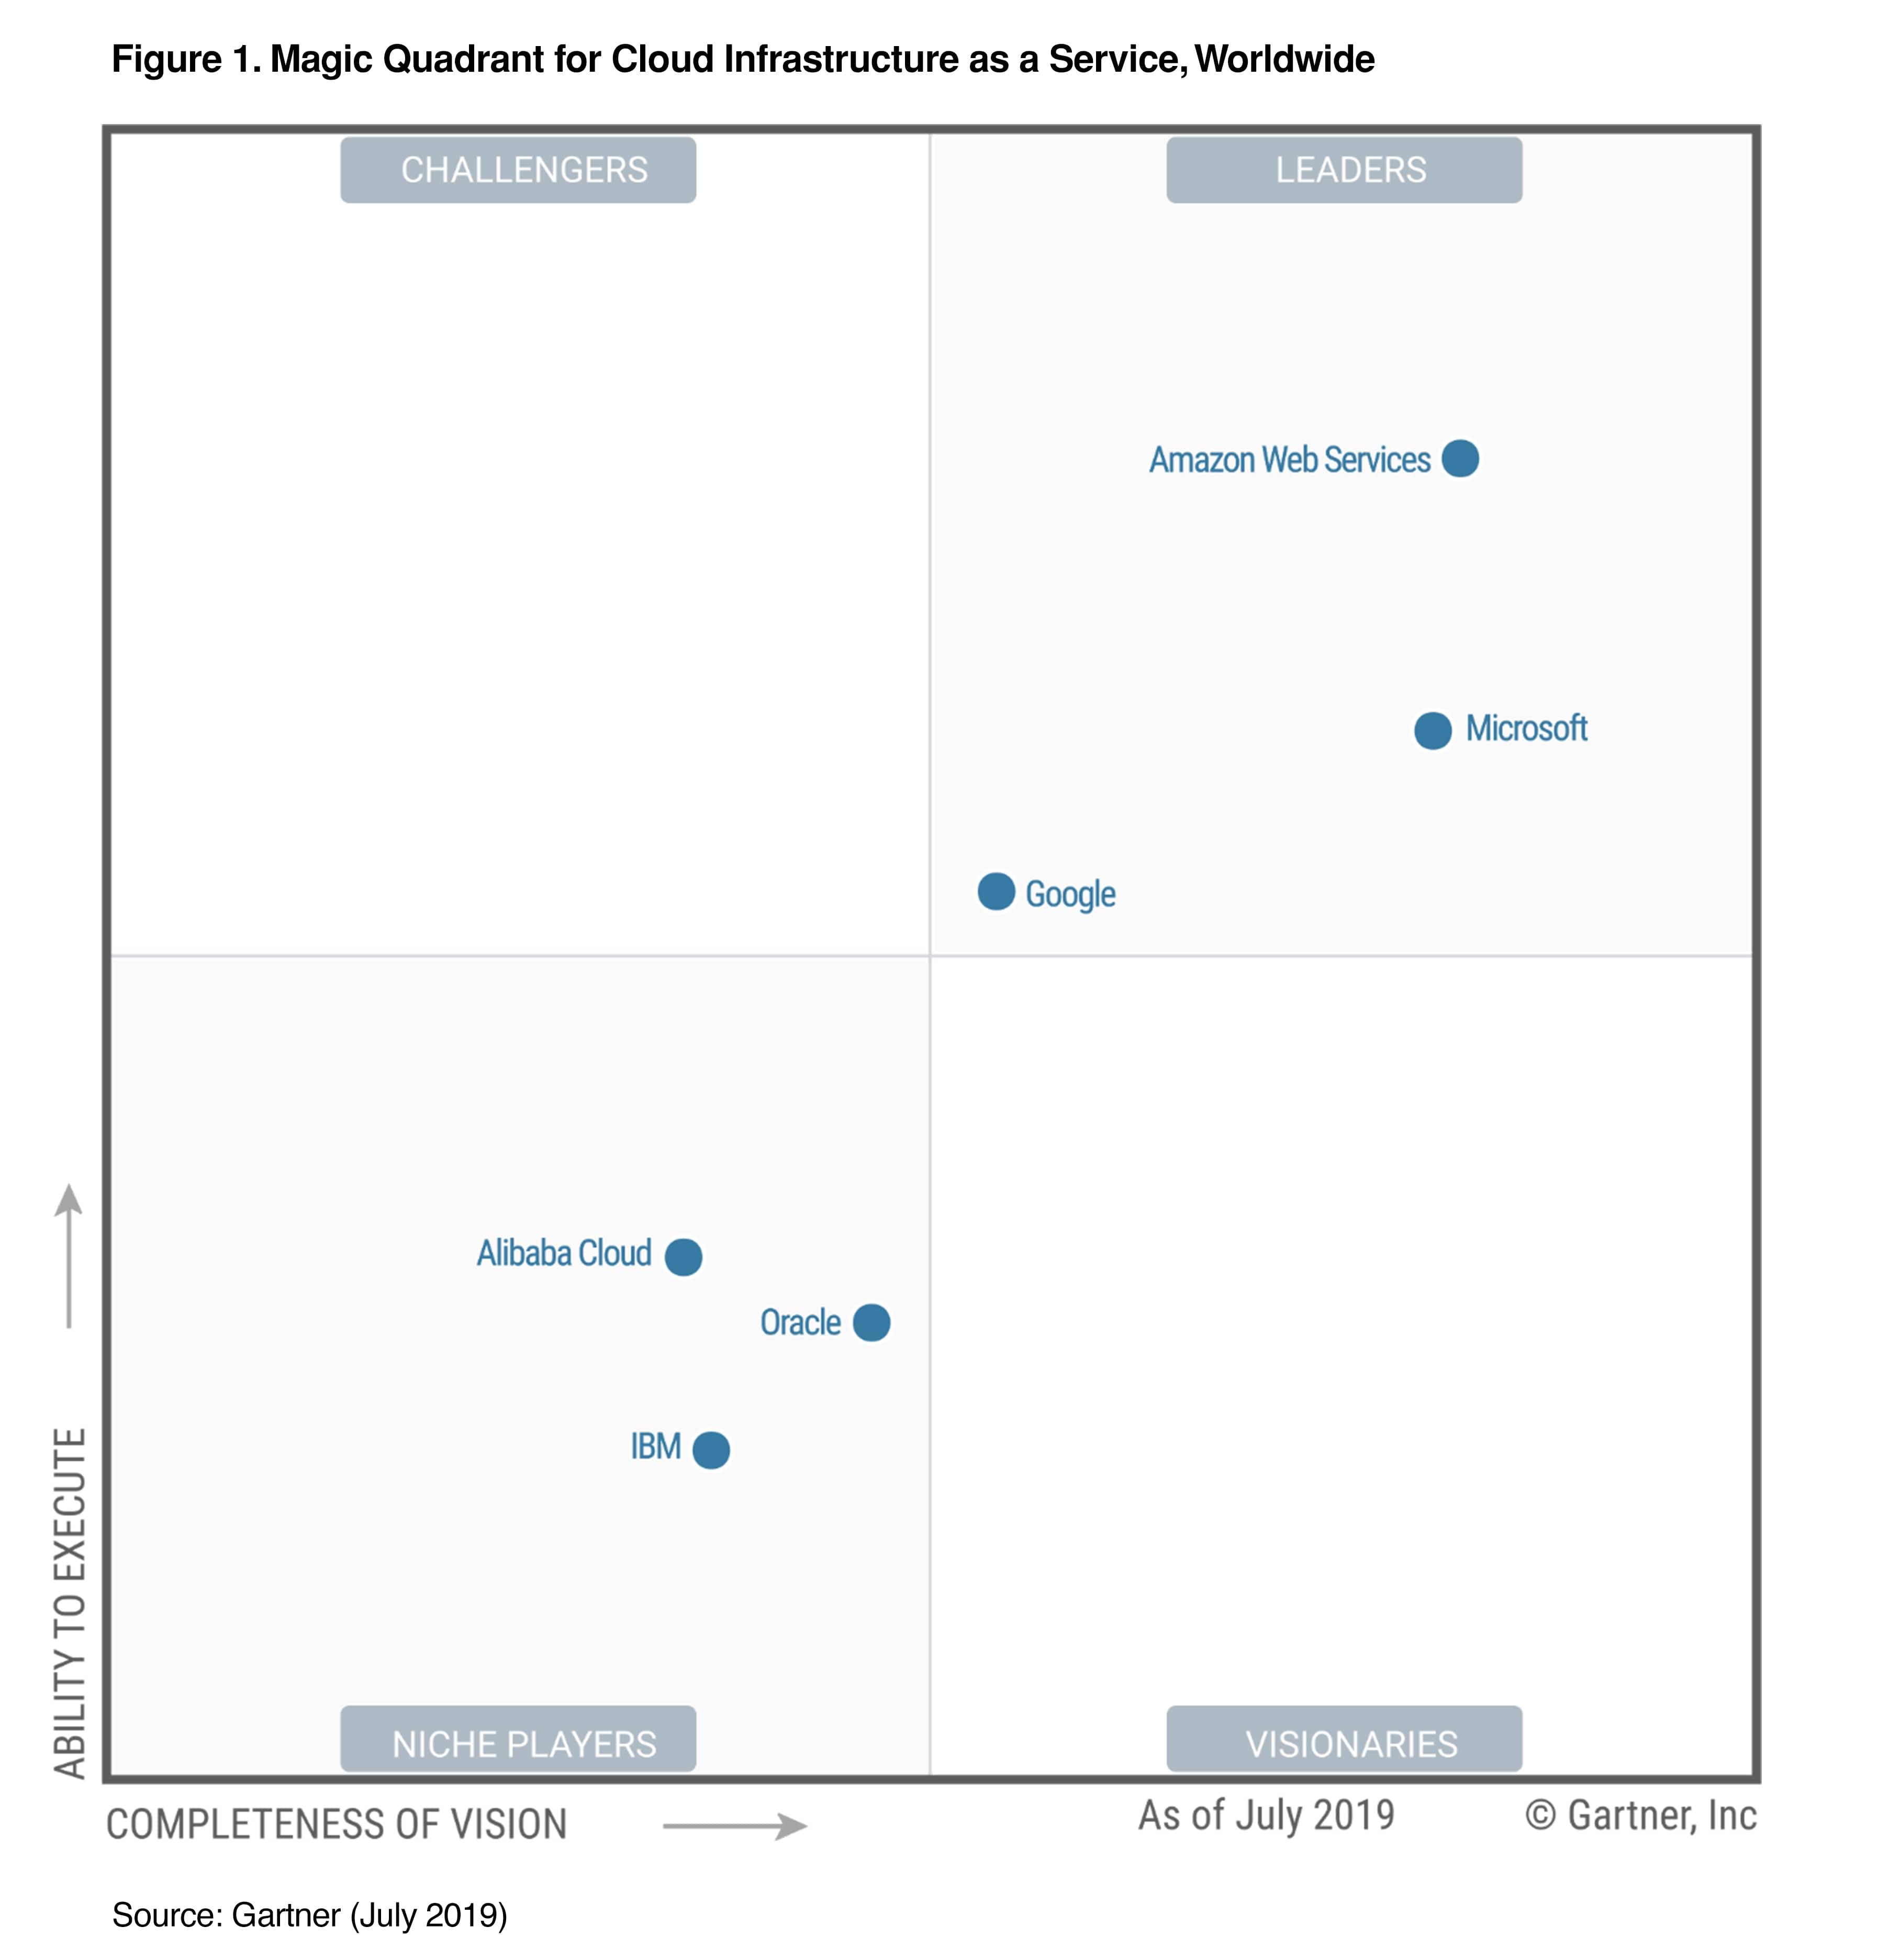 Magic Quadrant di Gartner per la categoria Cloud Infrastructure as a Service